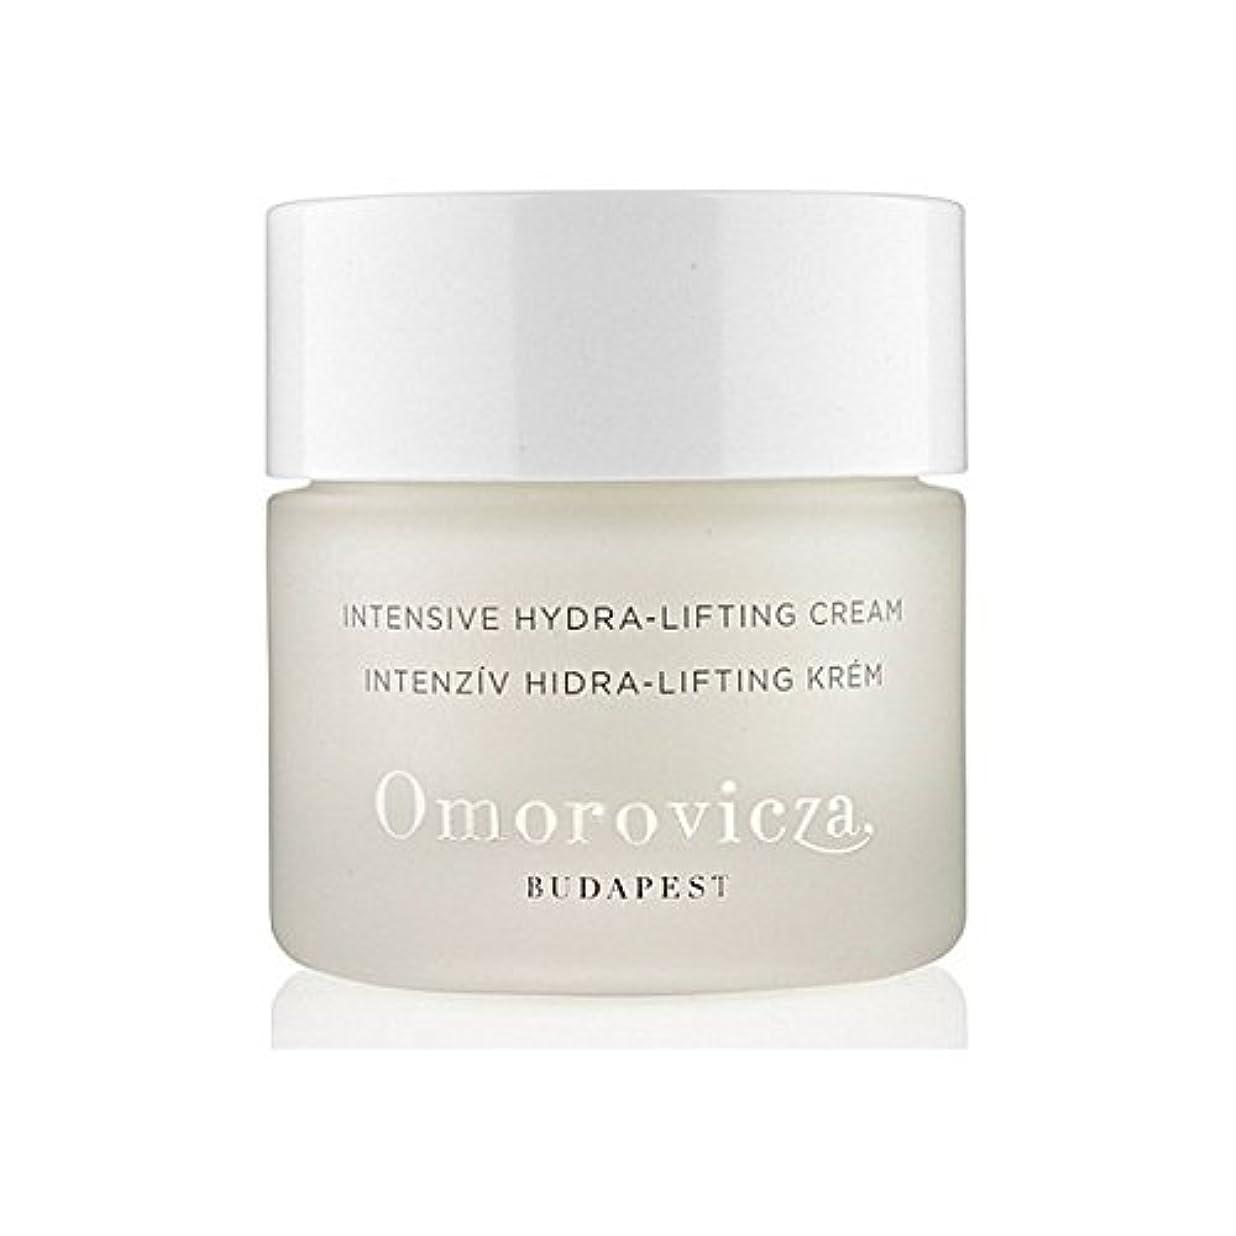 Omorovicza Intensive Hydra-Lifting Cream 50Ml (Pack of 6) - 集中的なヒドラリフティングクリーム50 x6 [並行輸入品]